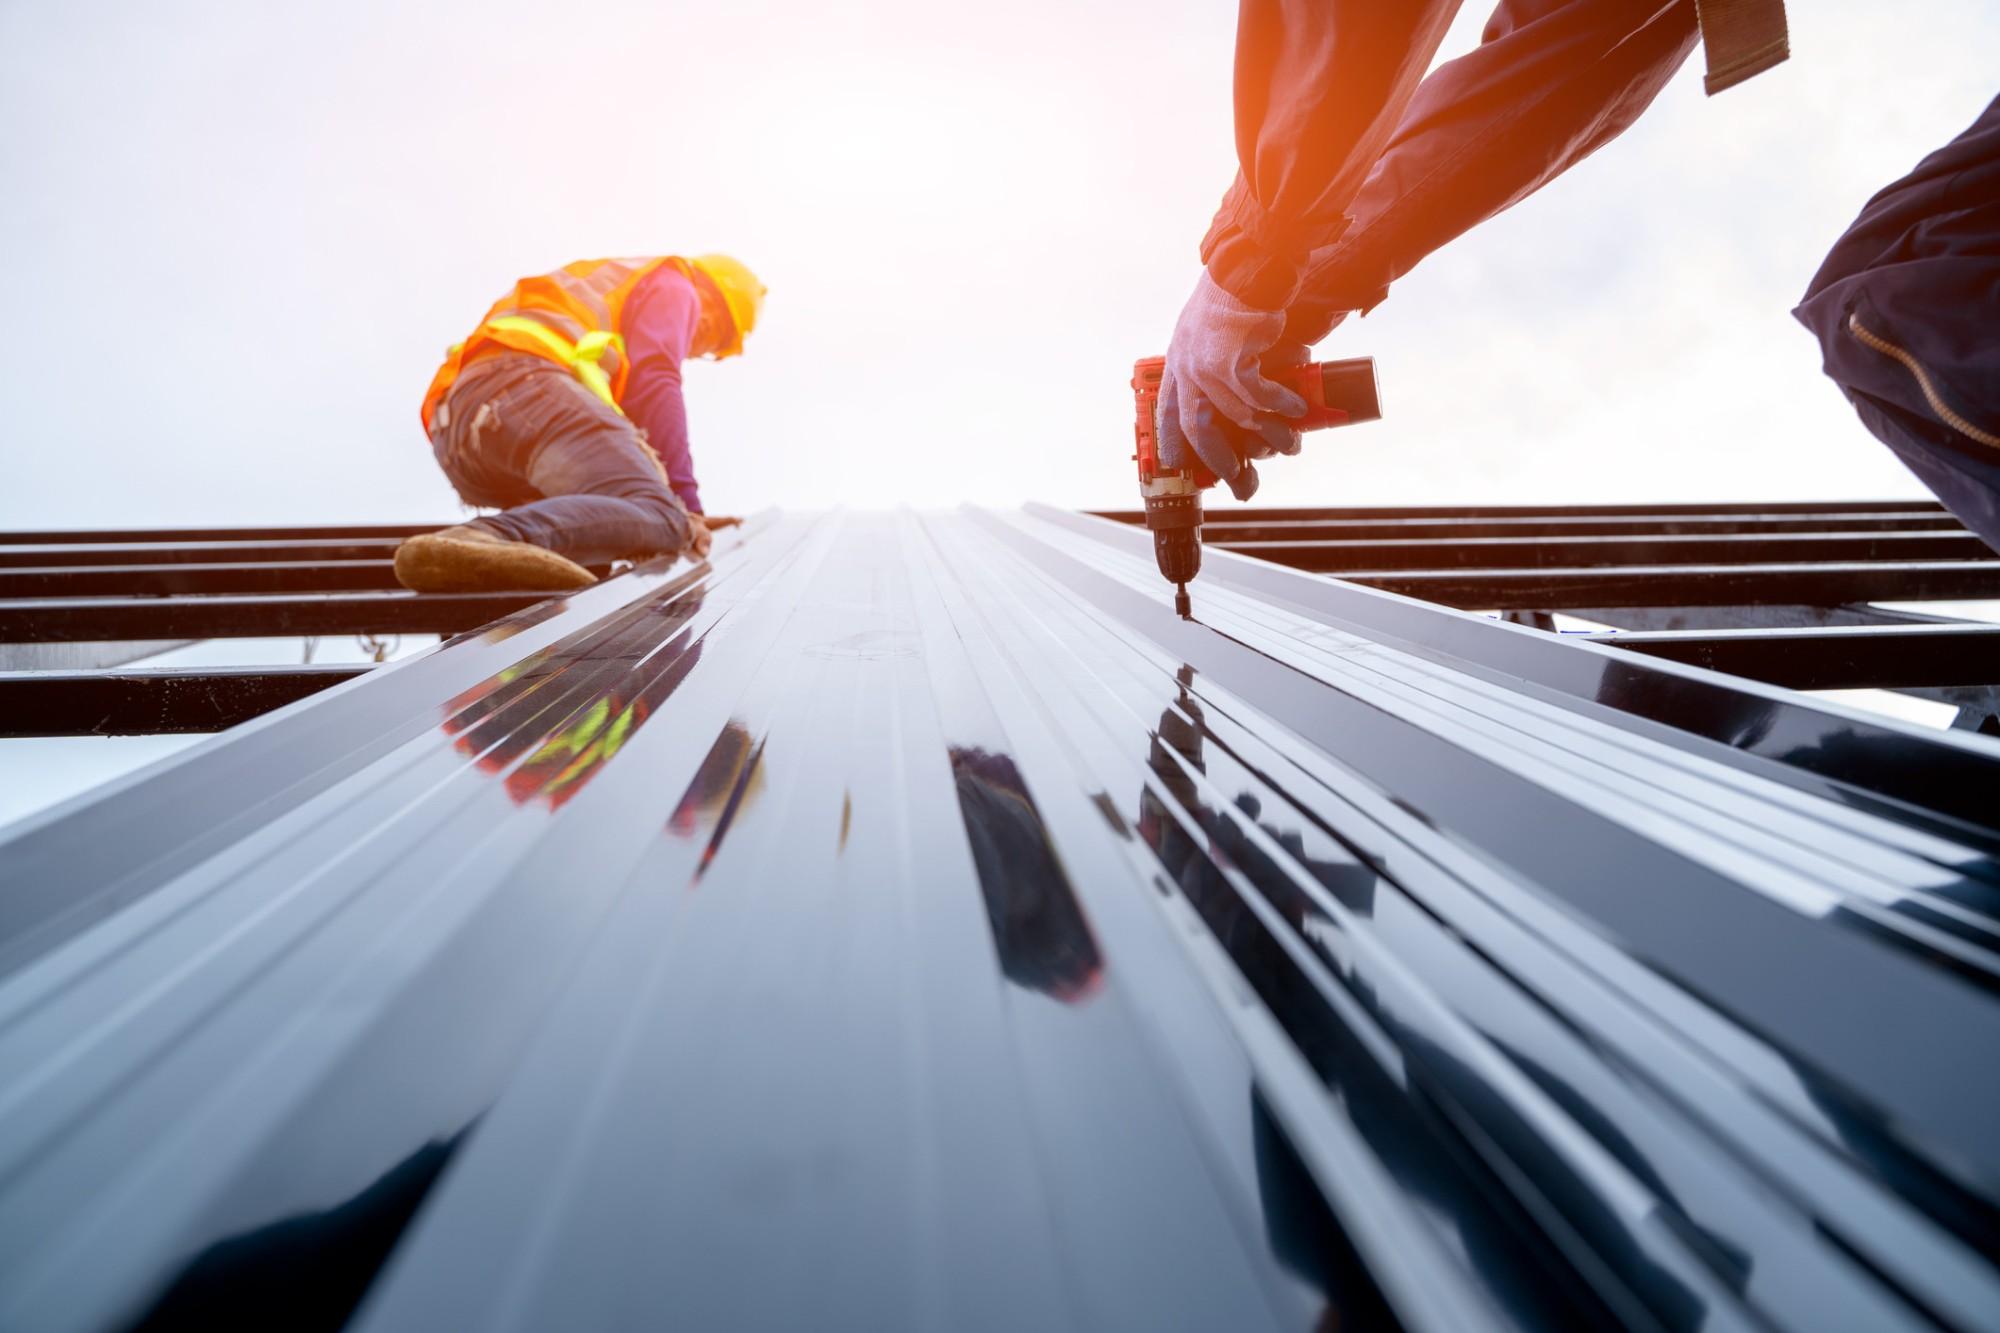 aço inox na construção civil